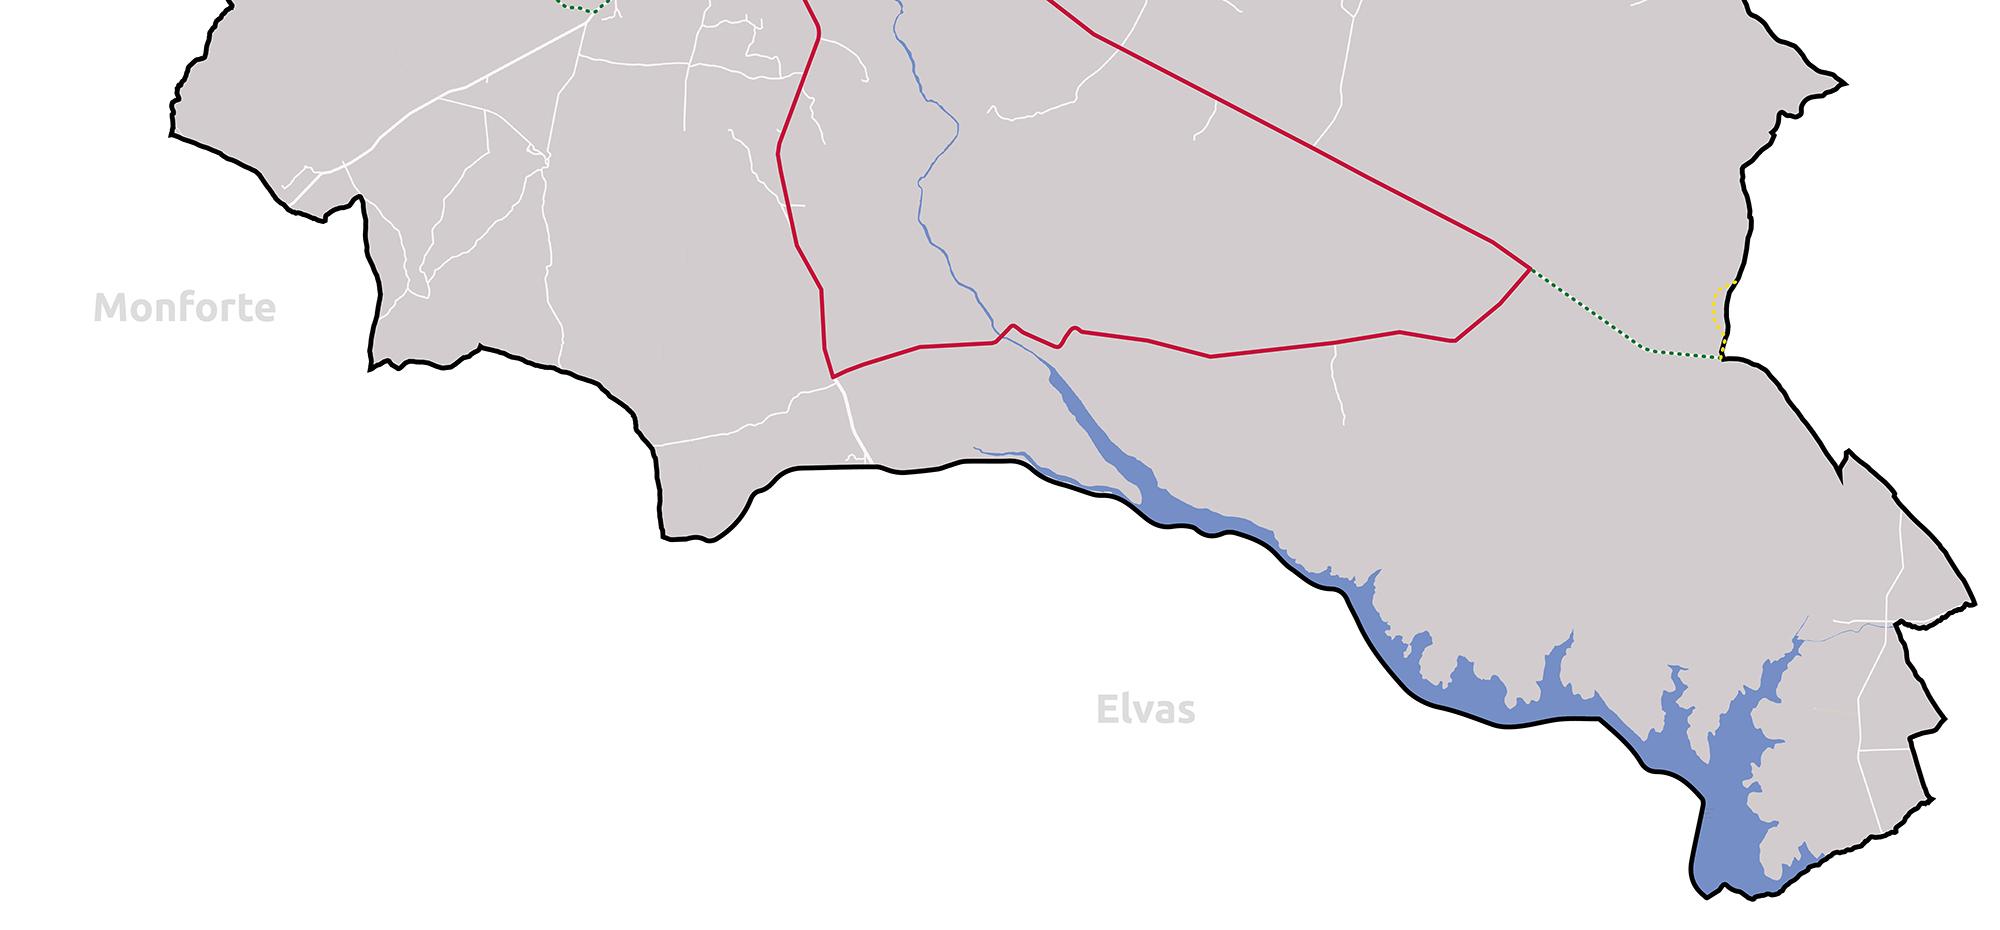 mapa_aumentado_2000x930_arronches_140716-02